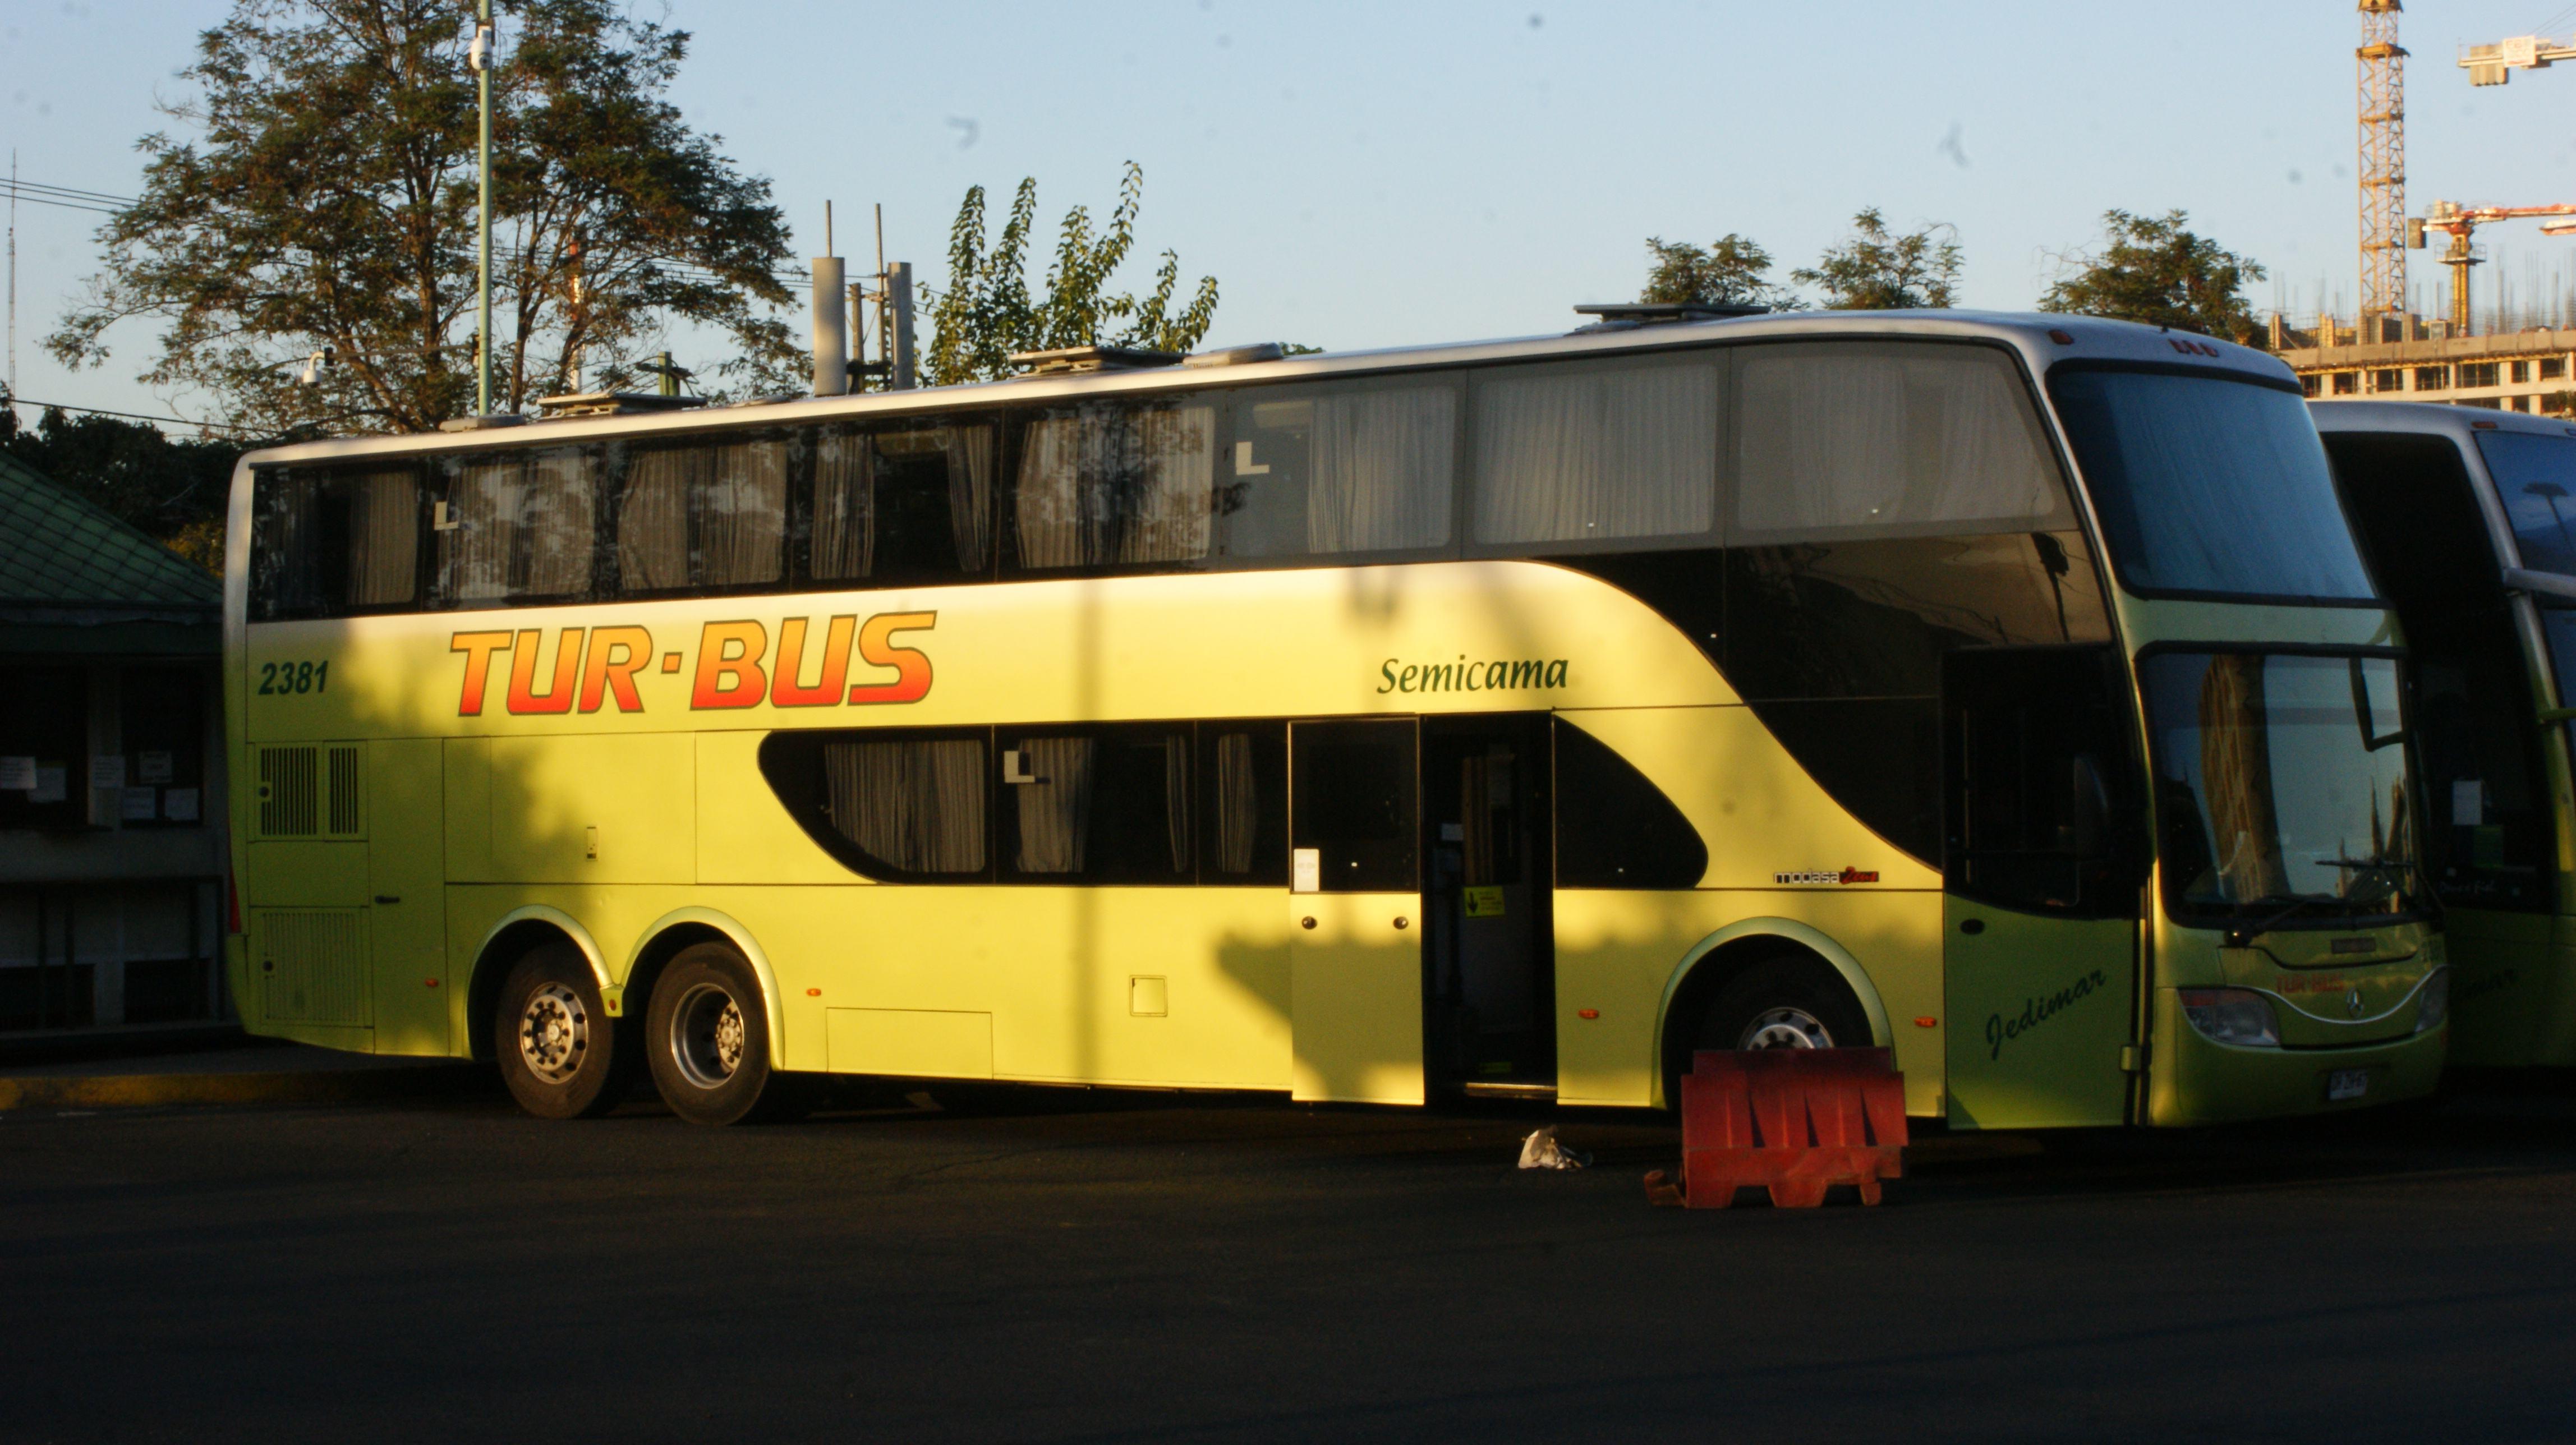 comment voyager voiture bus avion v lo cheval pick up paquebot camping car ferry. Black Bedroom Furniture Sets. Home Design Ideas